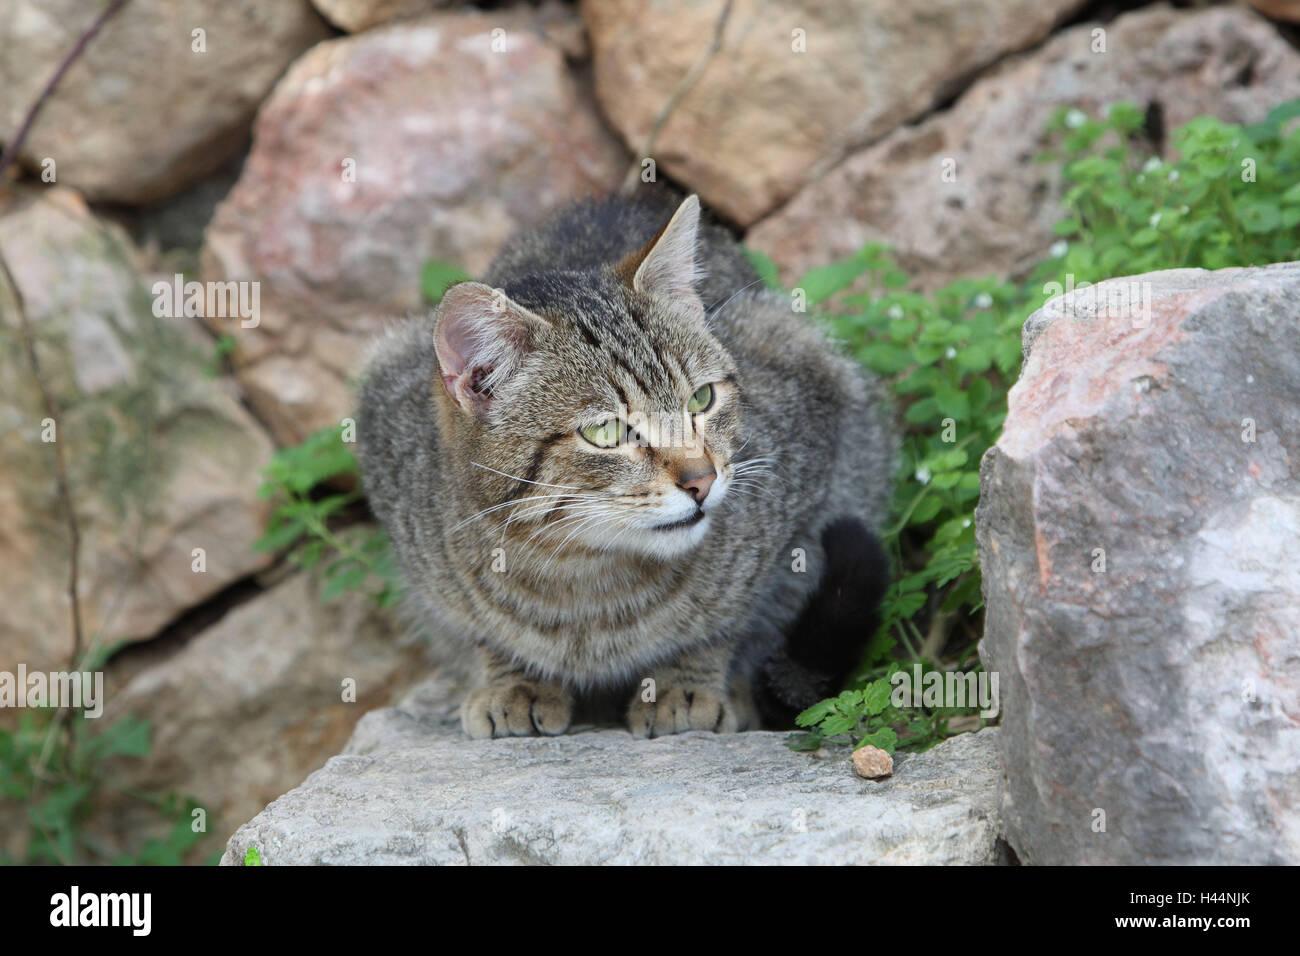 Gato, rayados, Crouch, escaleras, animales, mamíferos, mascotas, gatos pequeños, Felidae, domesticar, Imagen De Stock